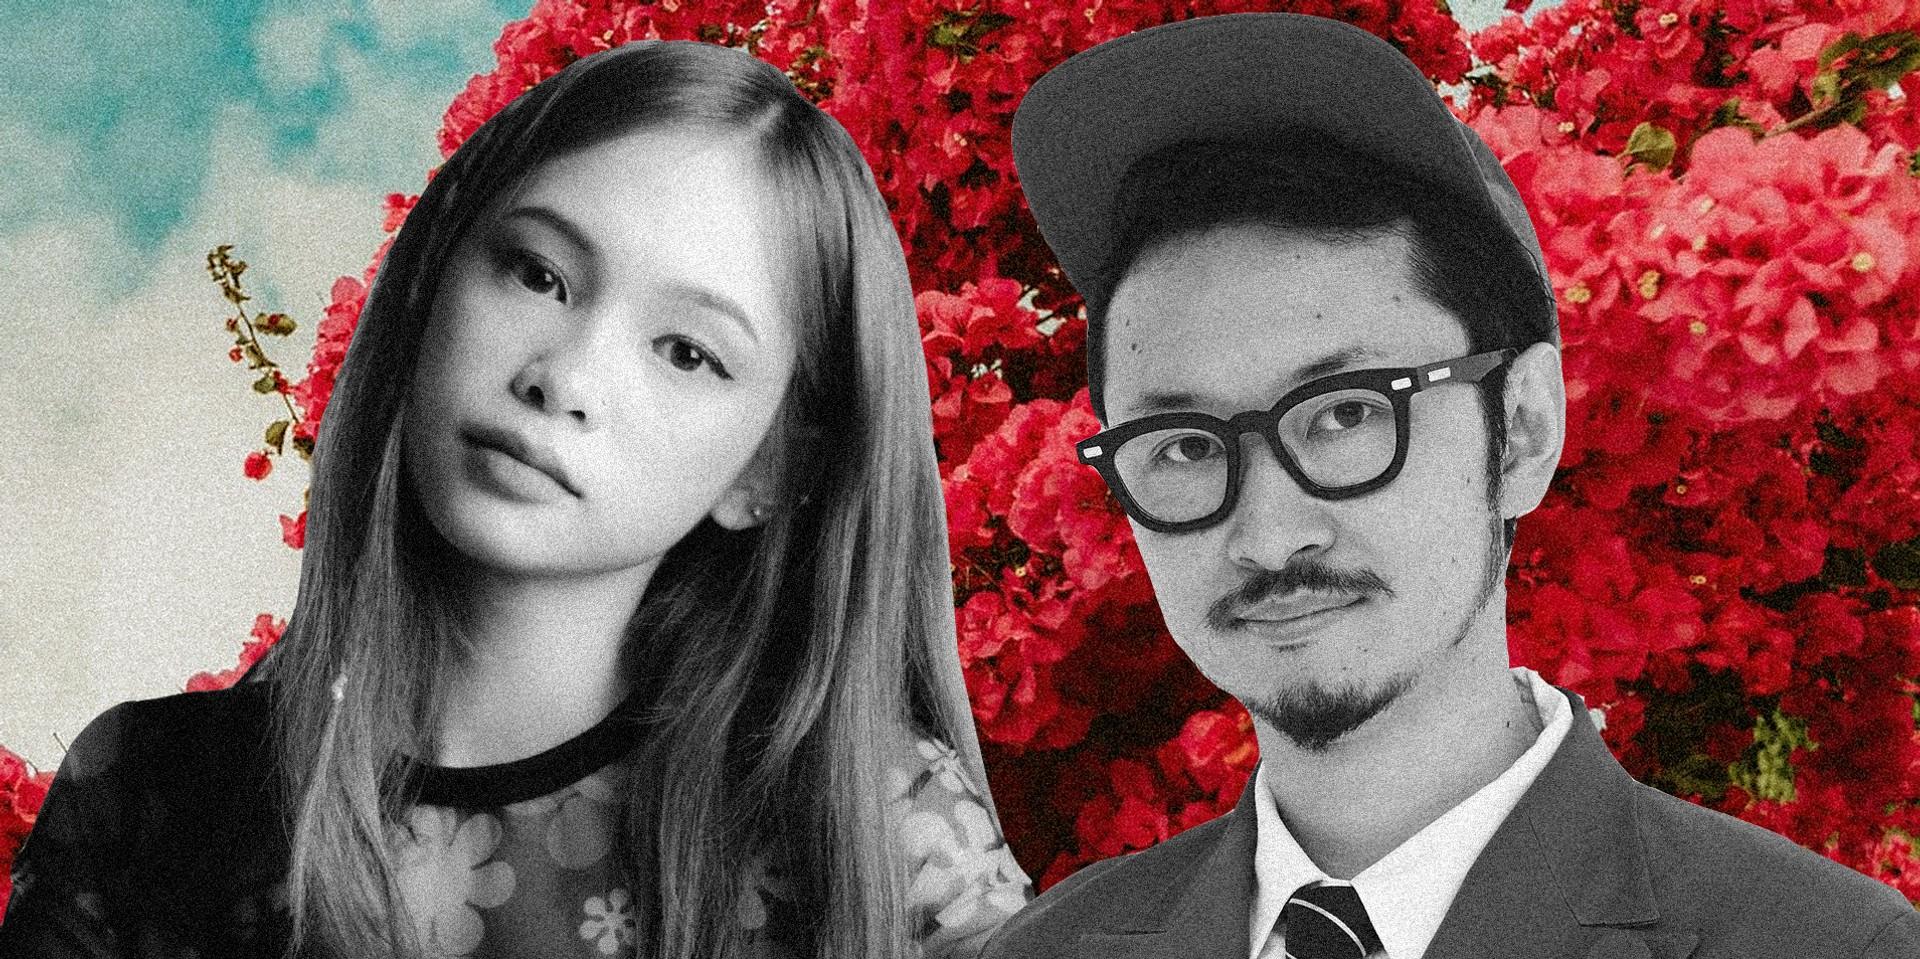 syd hartha and Yutaka Takanami share city pop take of The Cardigans' 'Carnival' – listen